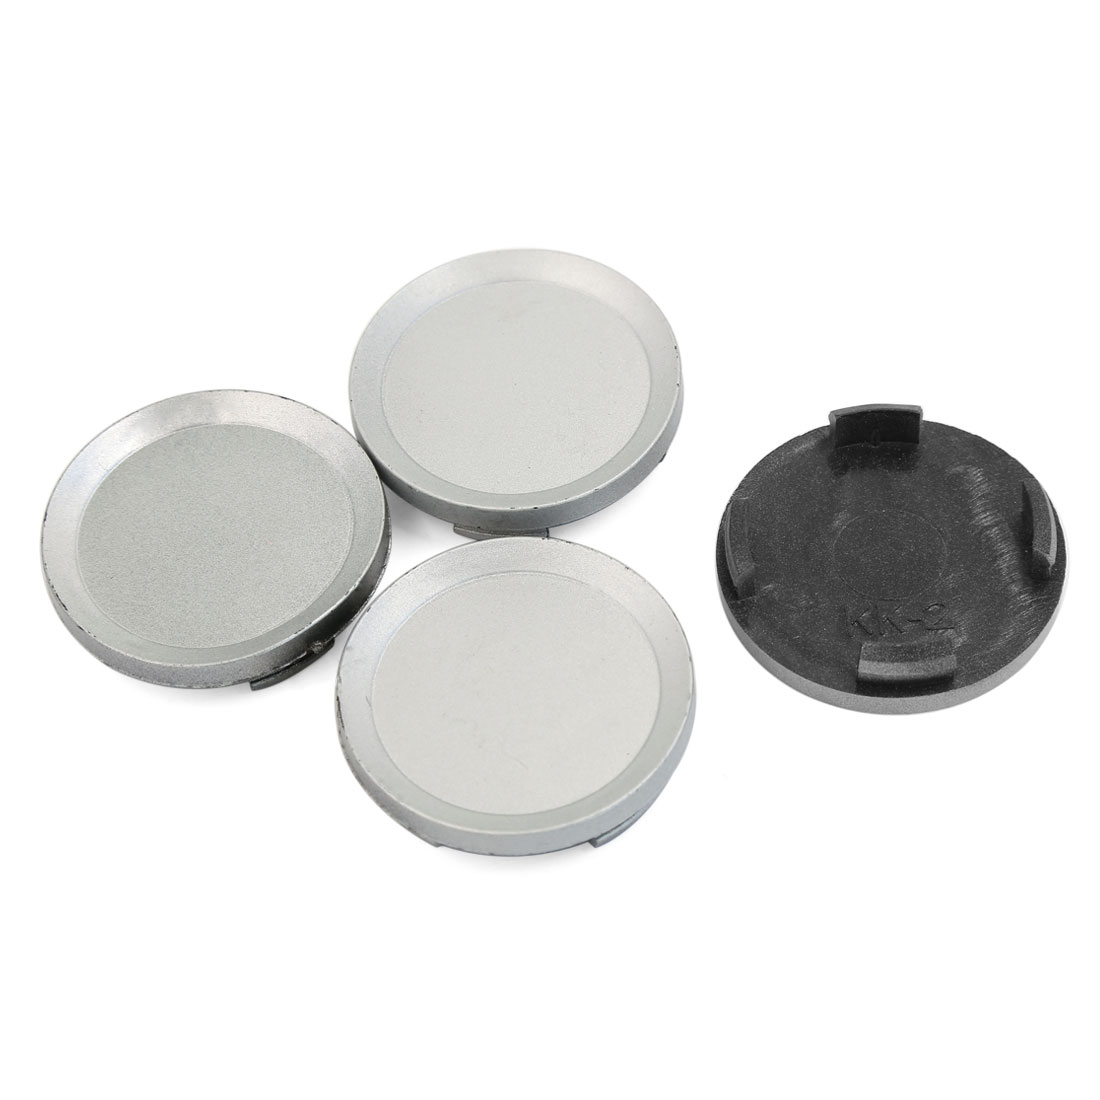 4 Pcs ABS Plastic 60mm Dia Vehicle Car Wheel Rim Center Hub Caps Cover